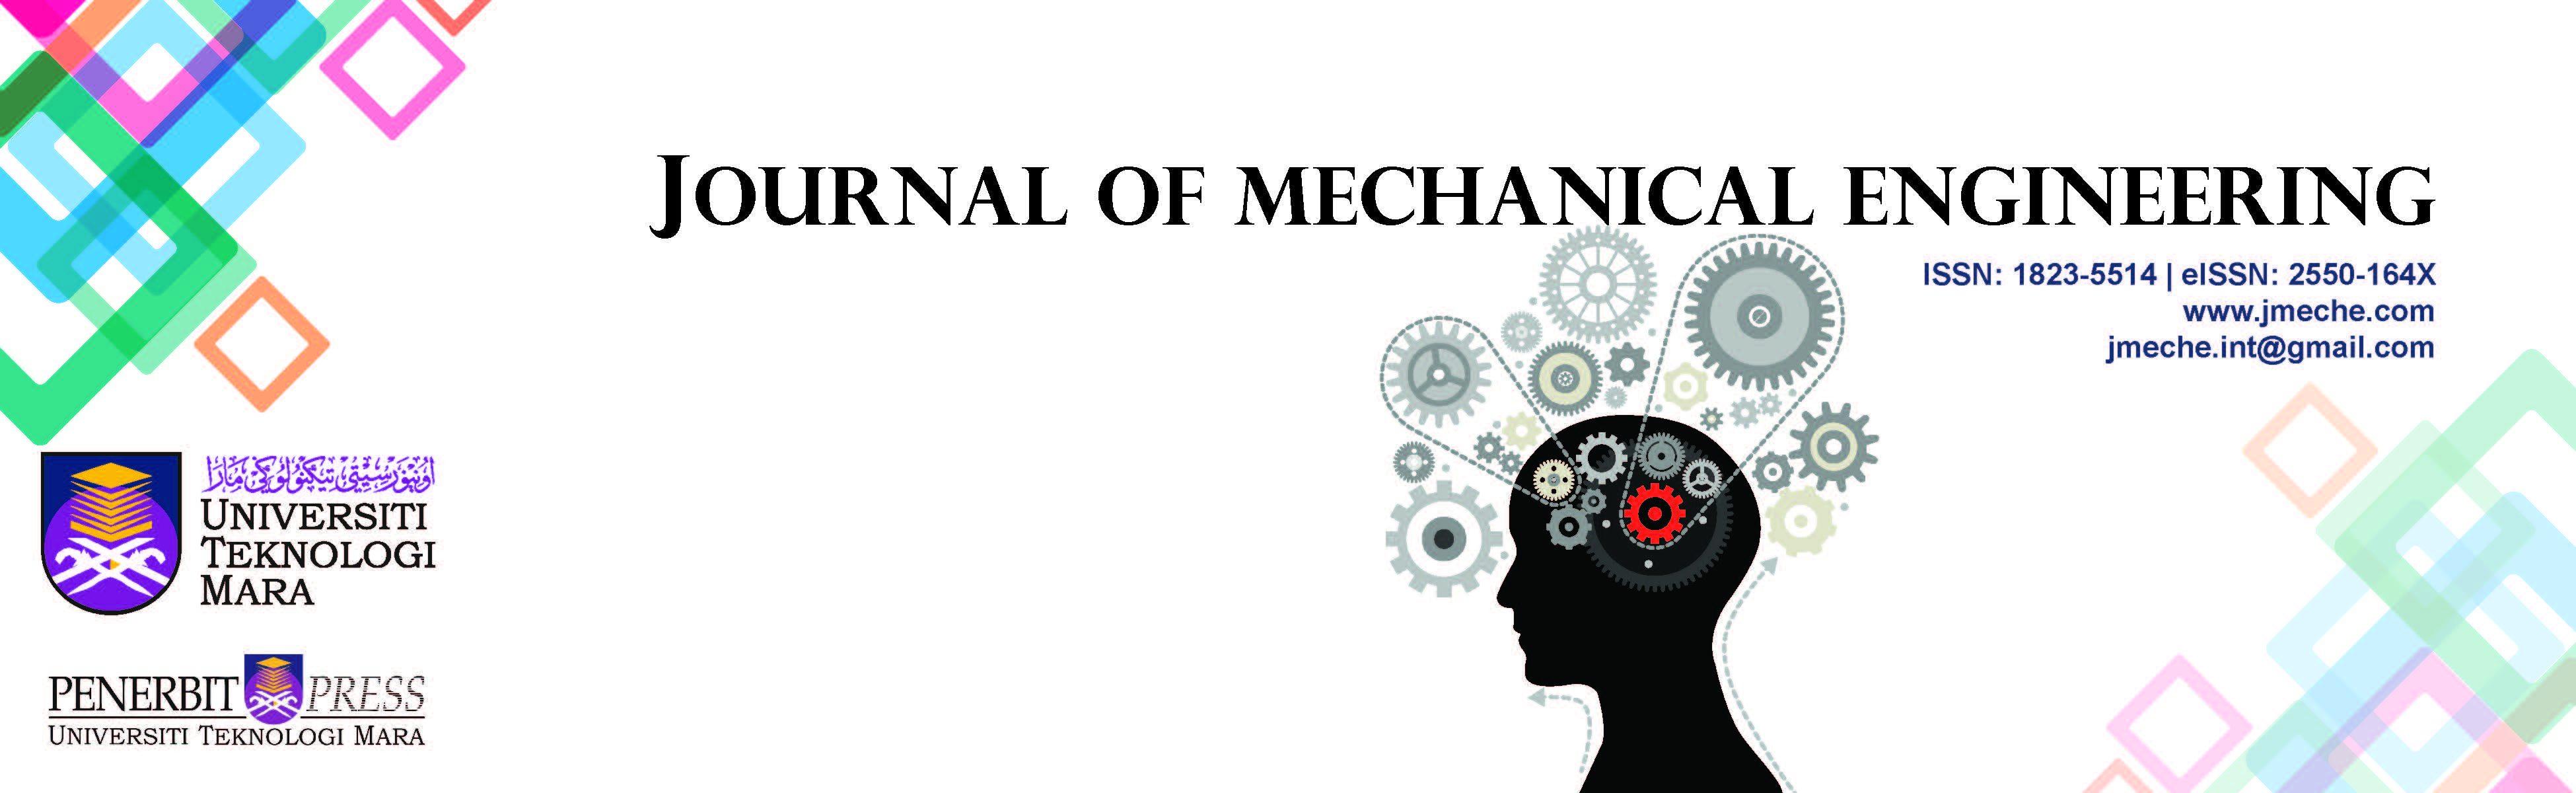 Journal of Mechanical Engineering